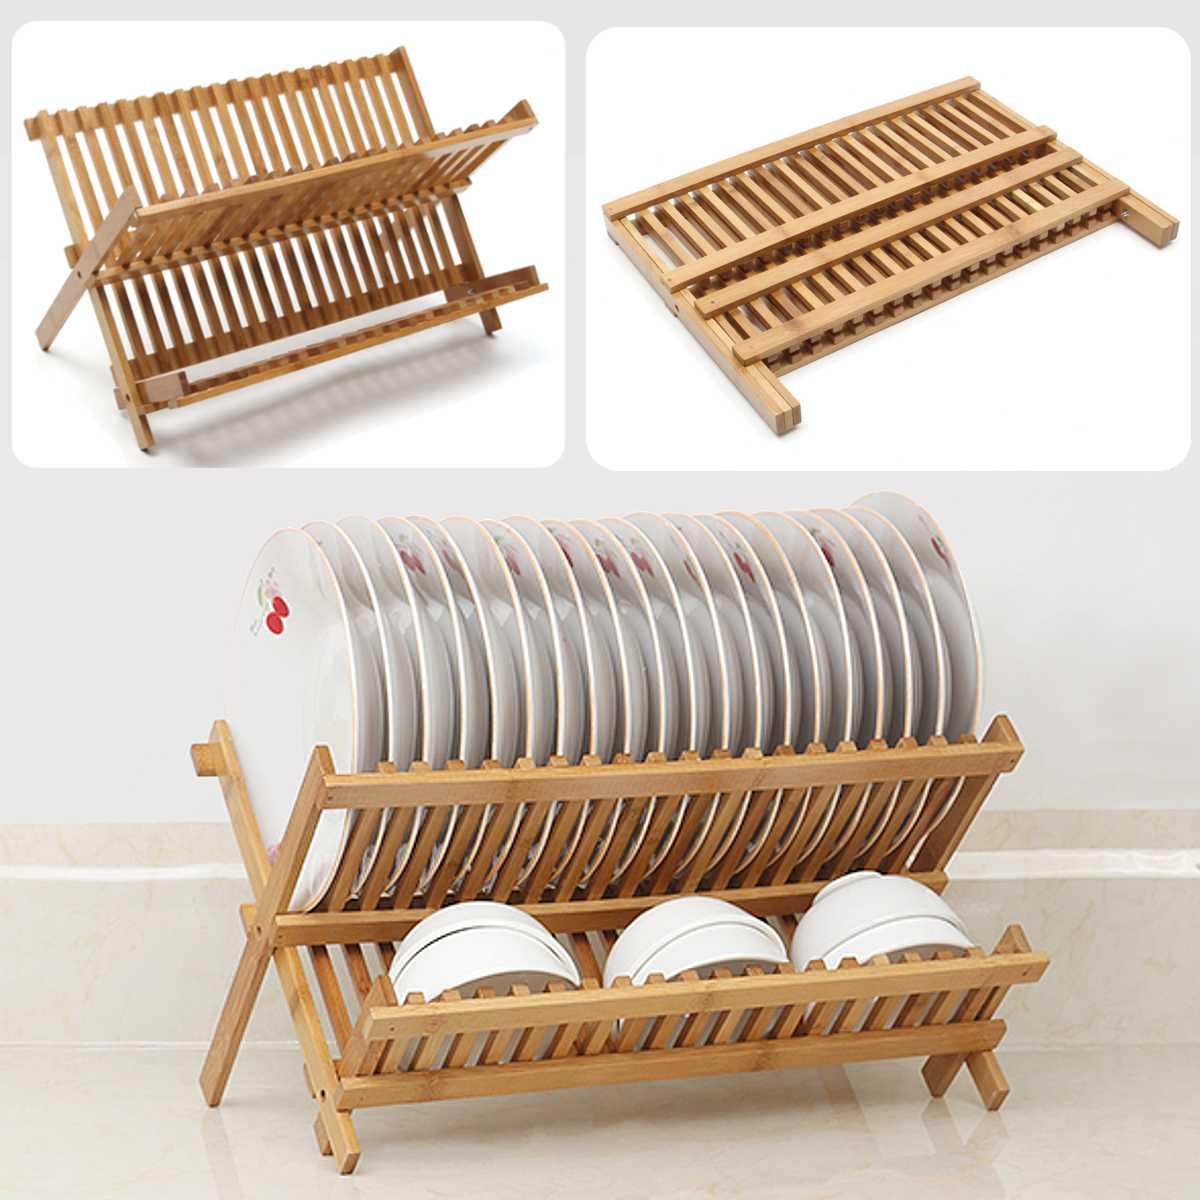 Folding Bamboo Dish Rack Drying Rack Holder Vegetable Fruit Flatware Storage Holder Drainer Wood Kitchen Sink Drain Basket